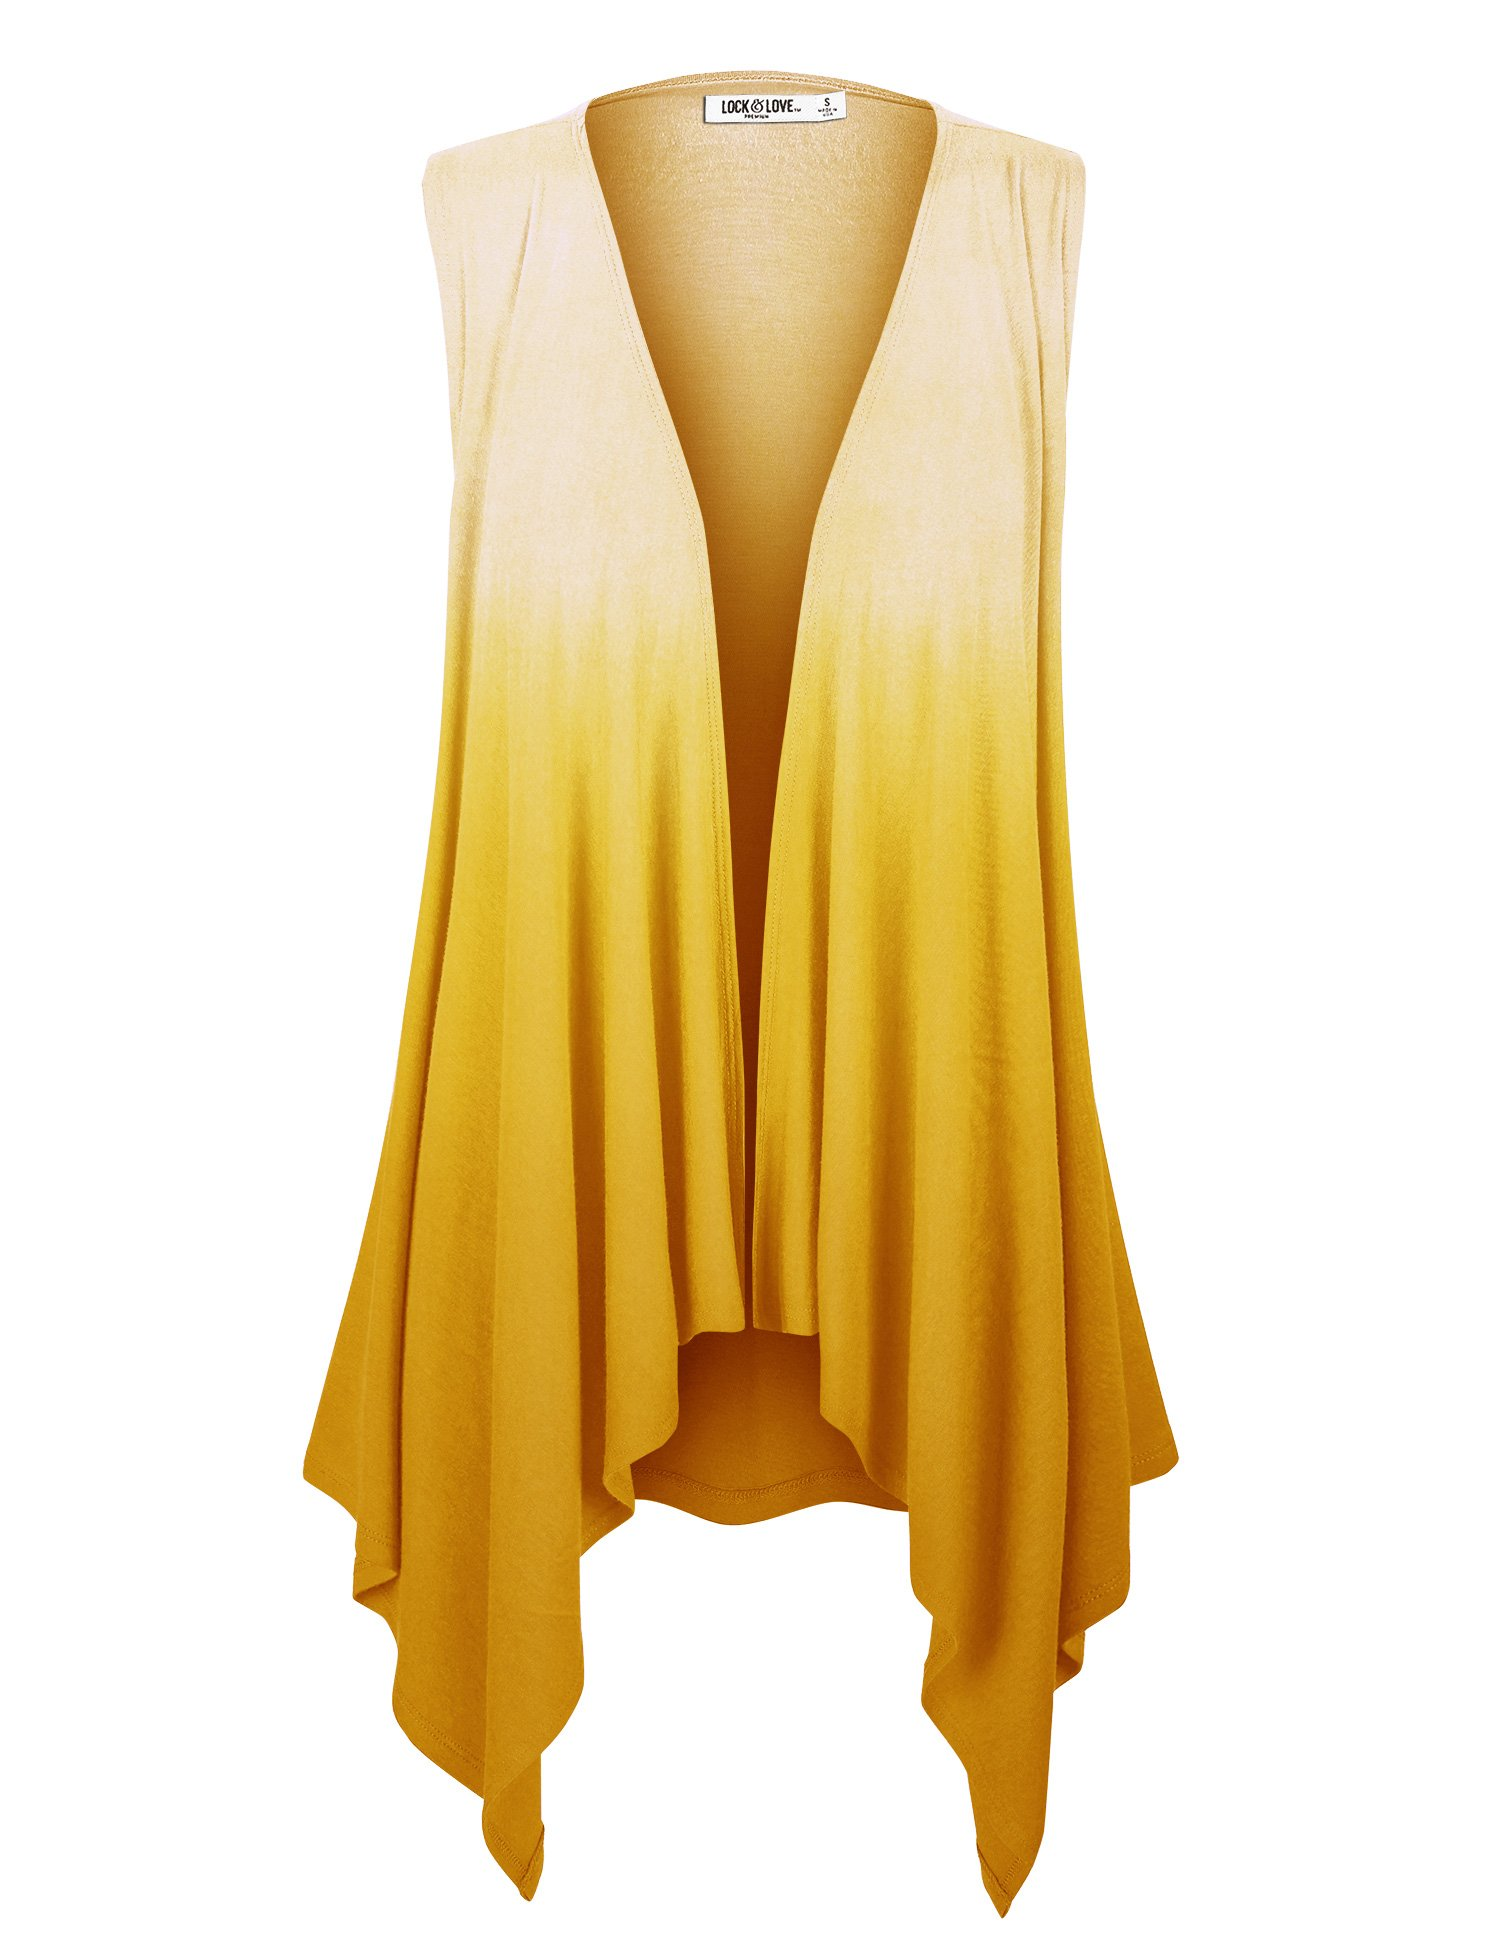 WSK1095 Womens Lightweight Sleeveless Ombre Open Front Cardigan Vest XXL YELLOW